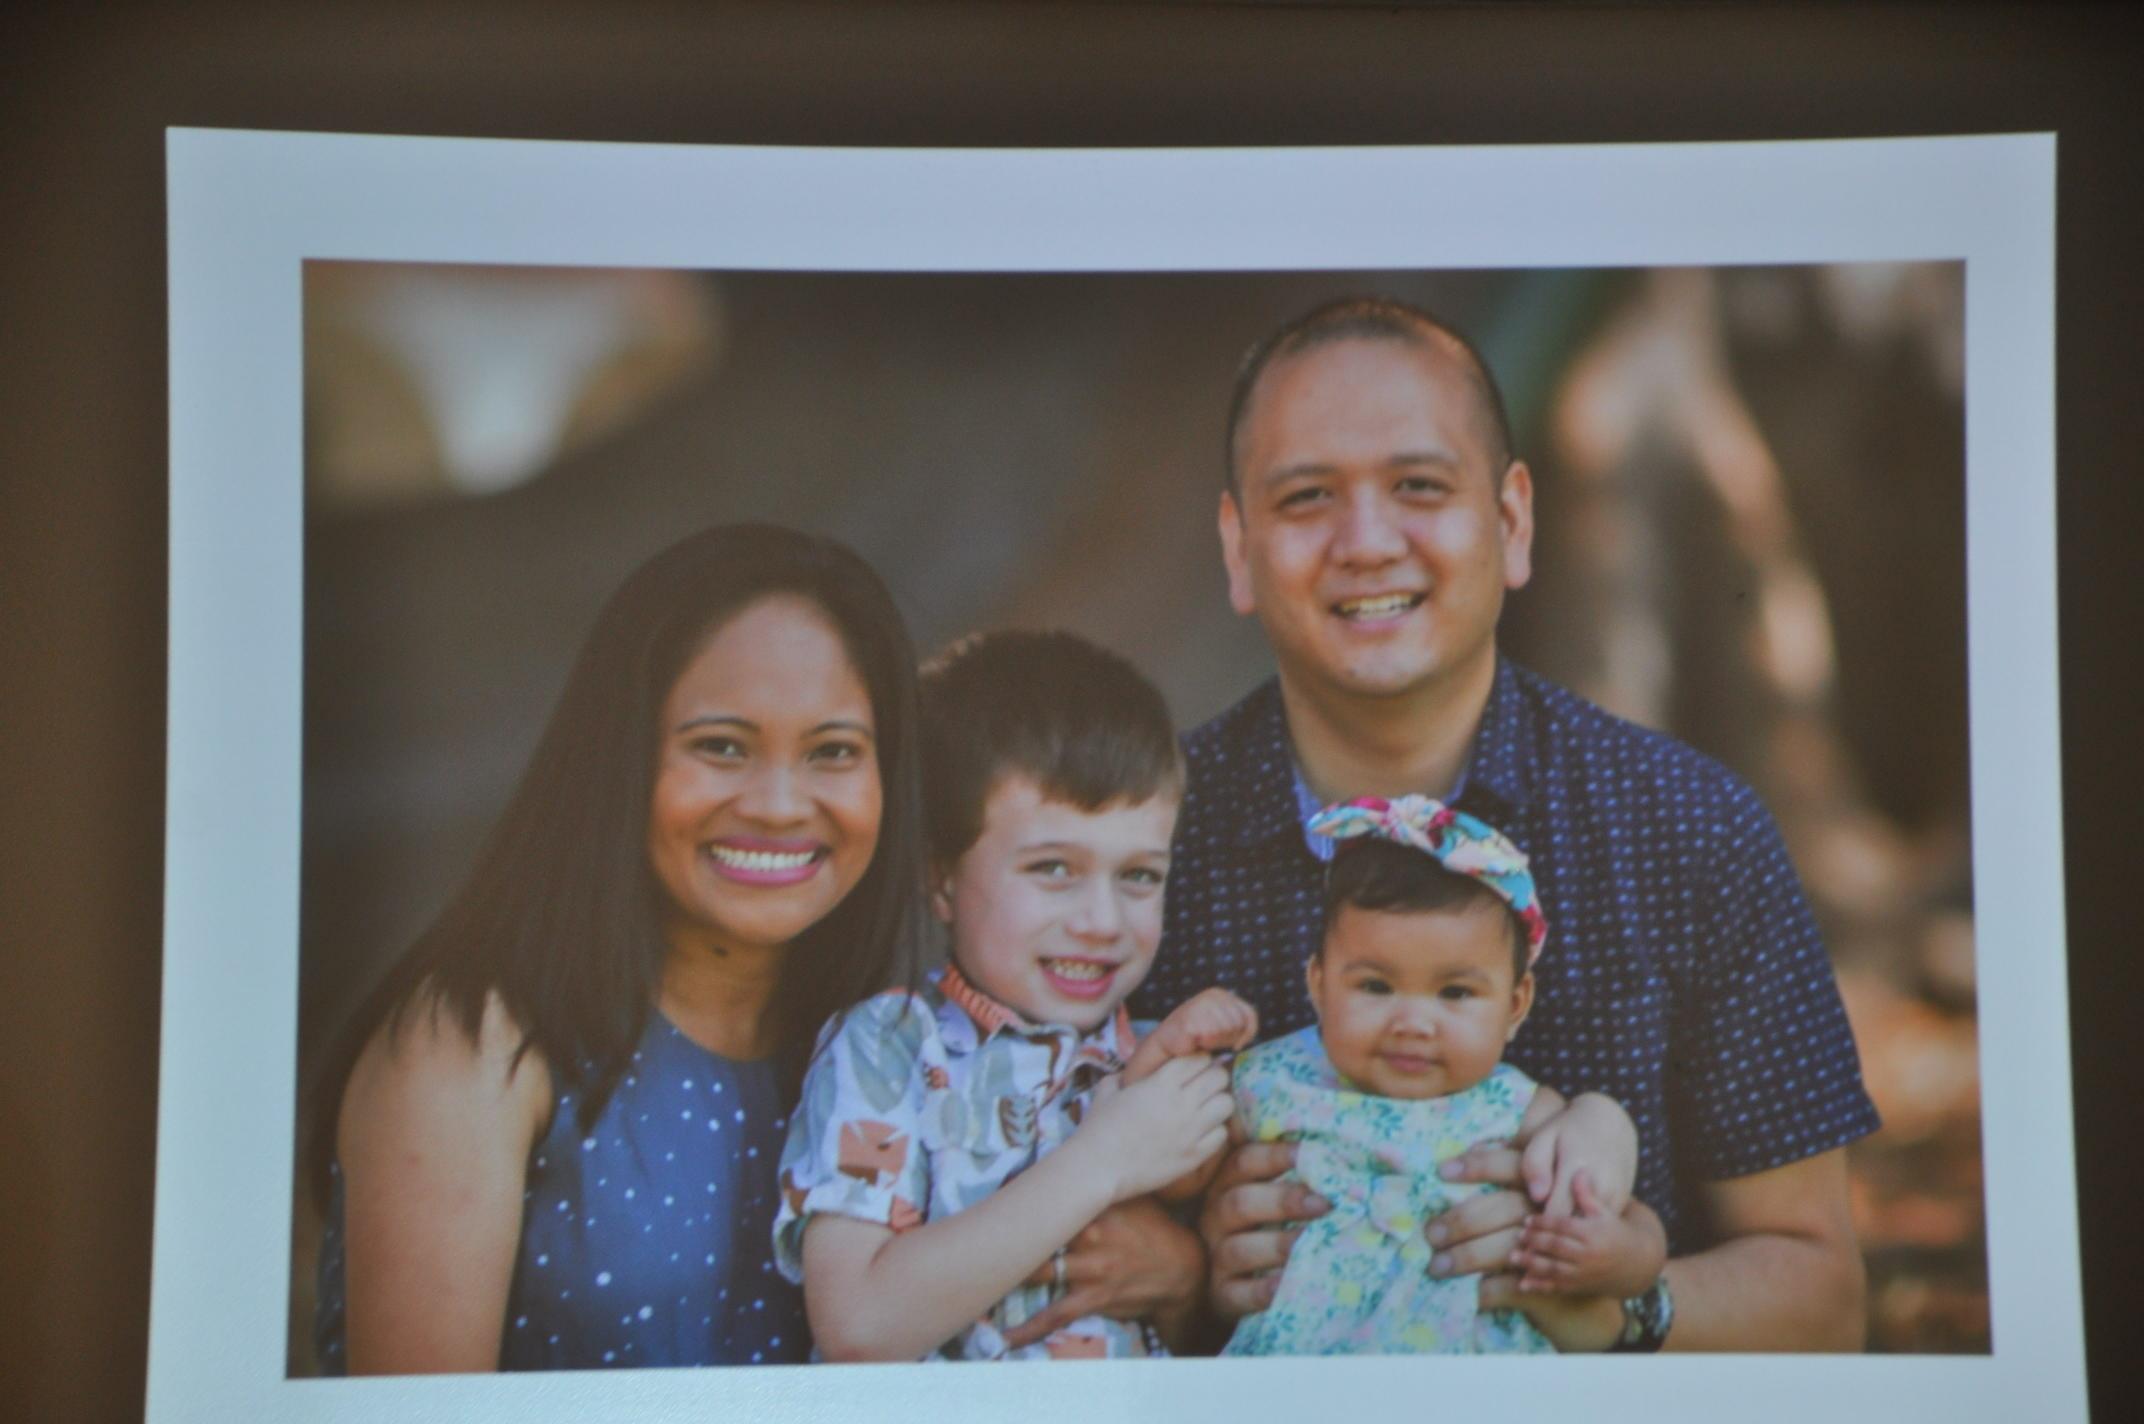 Brandon周夫婦和領養的孩子。(記者張越/翻拍)